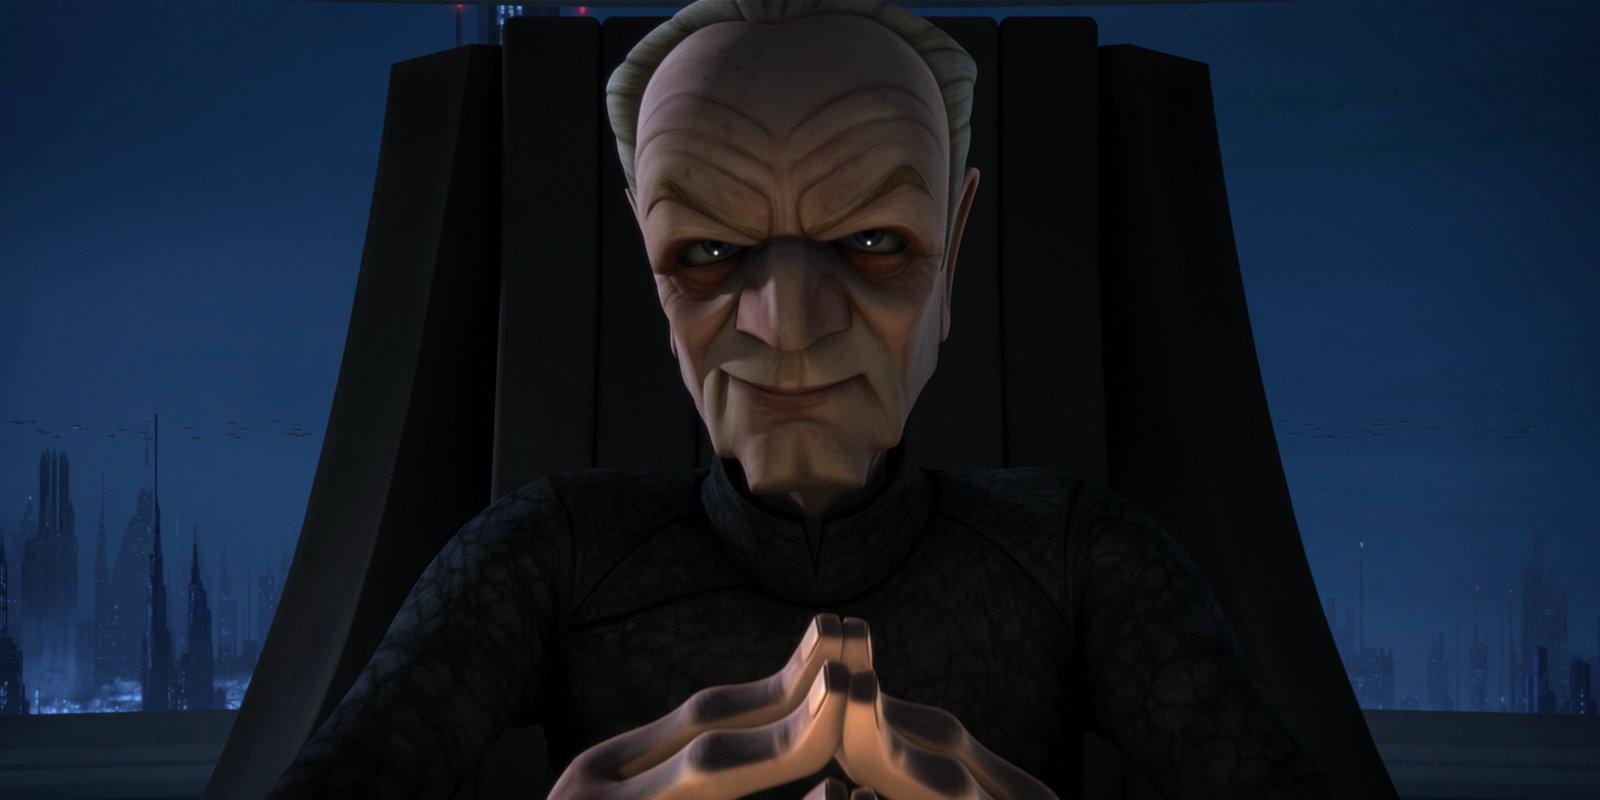 Star Wars Rebels Wont Feature Palpatine